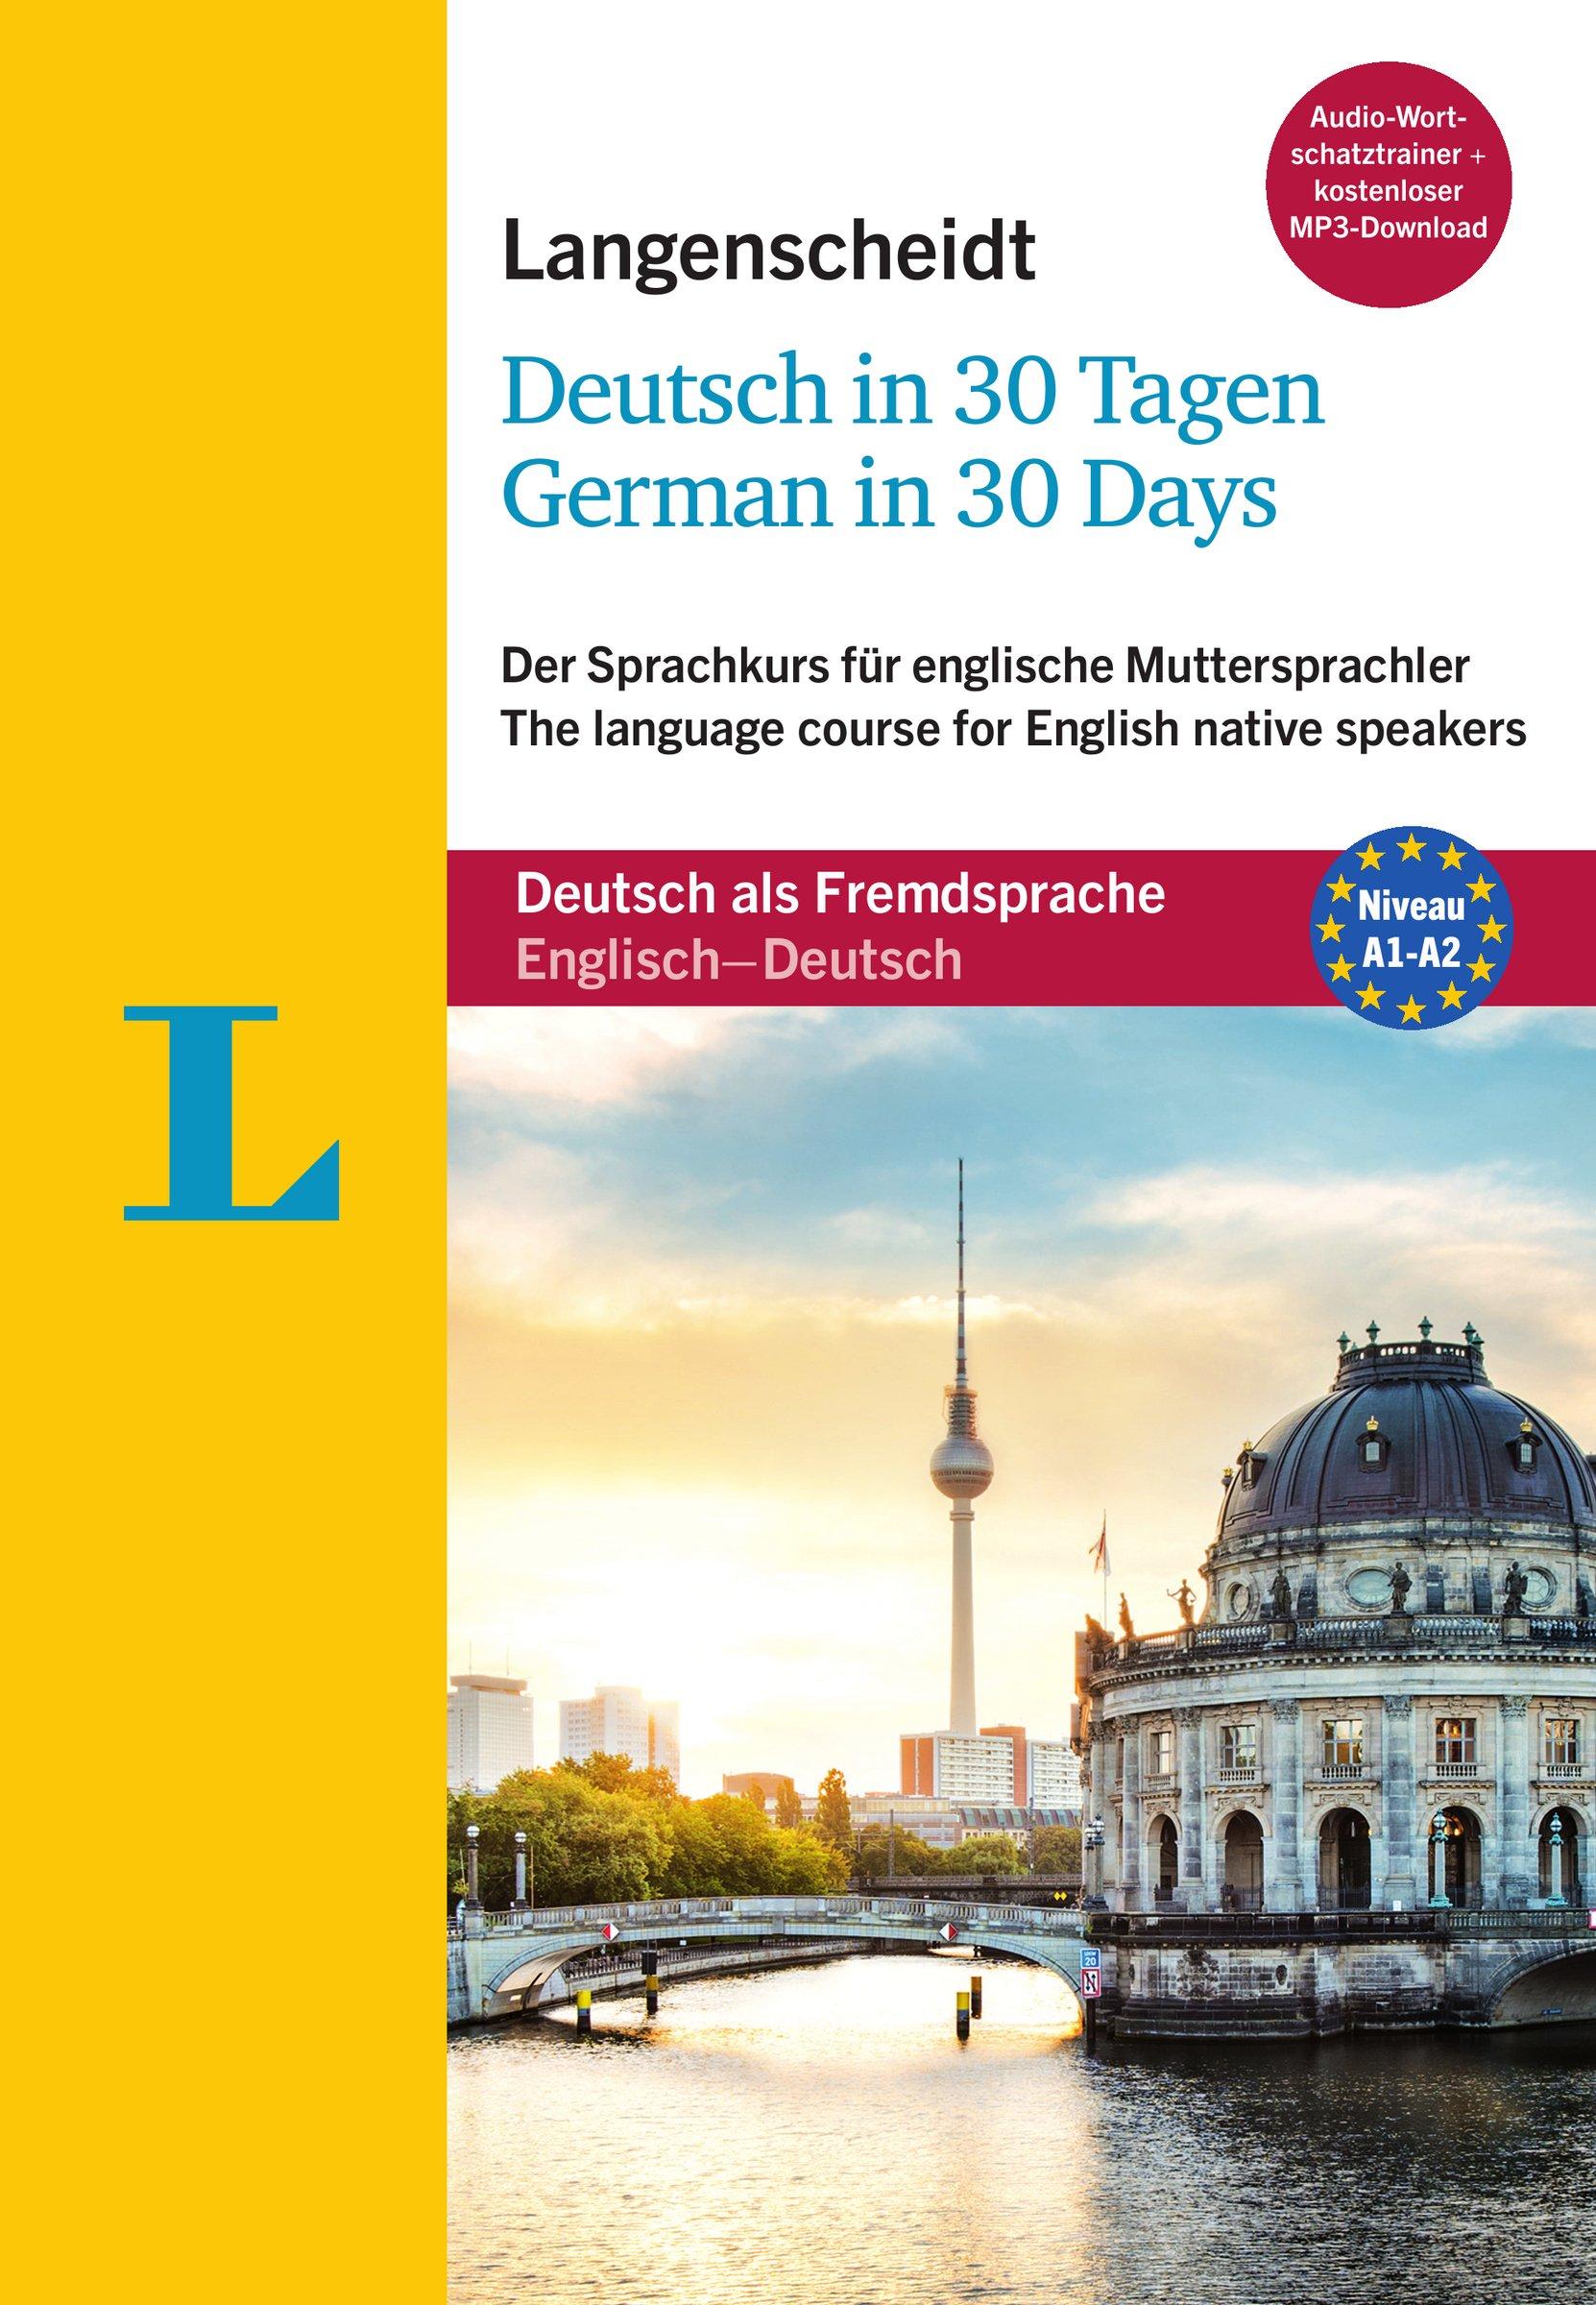 Deutsch in 30 Tagen: Buch mit 2 Audio-CDs + 1 CD MP3 + MP3 Download: Peter  Hartling: 9783468280498: Amazon.com: Books